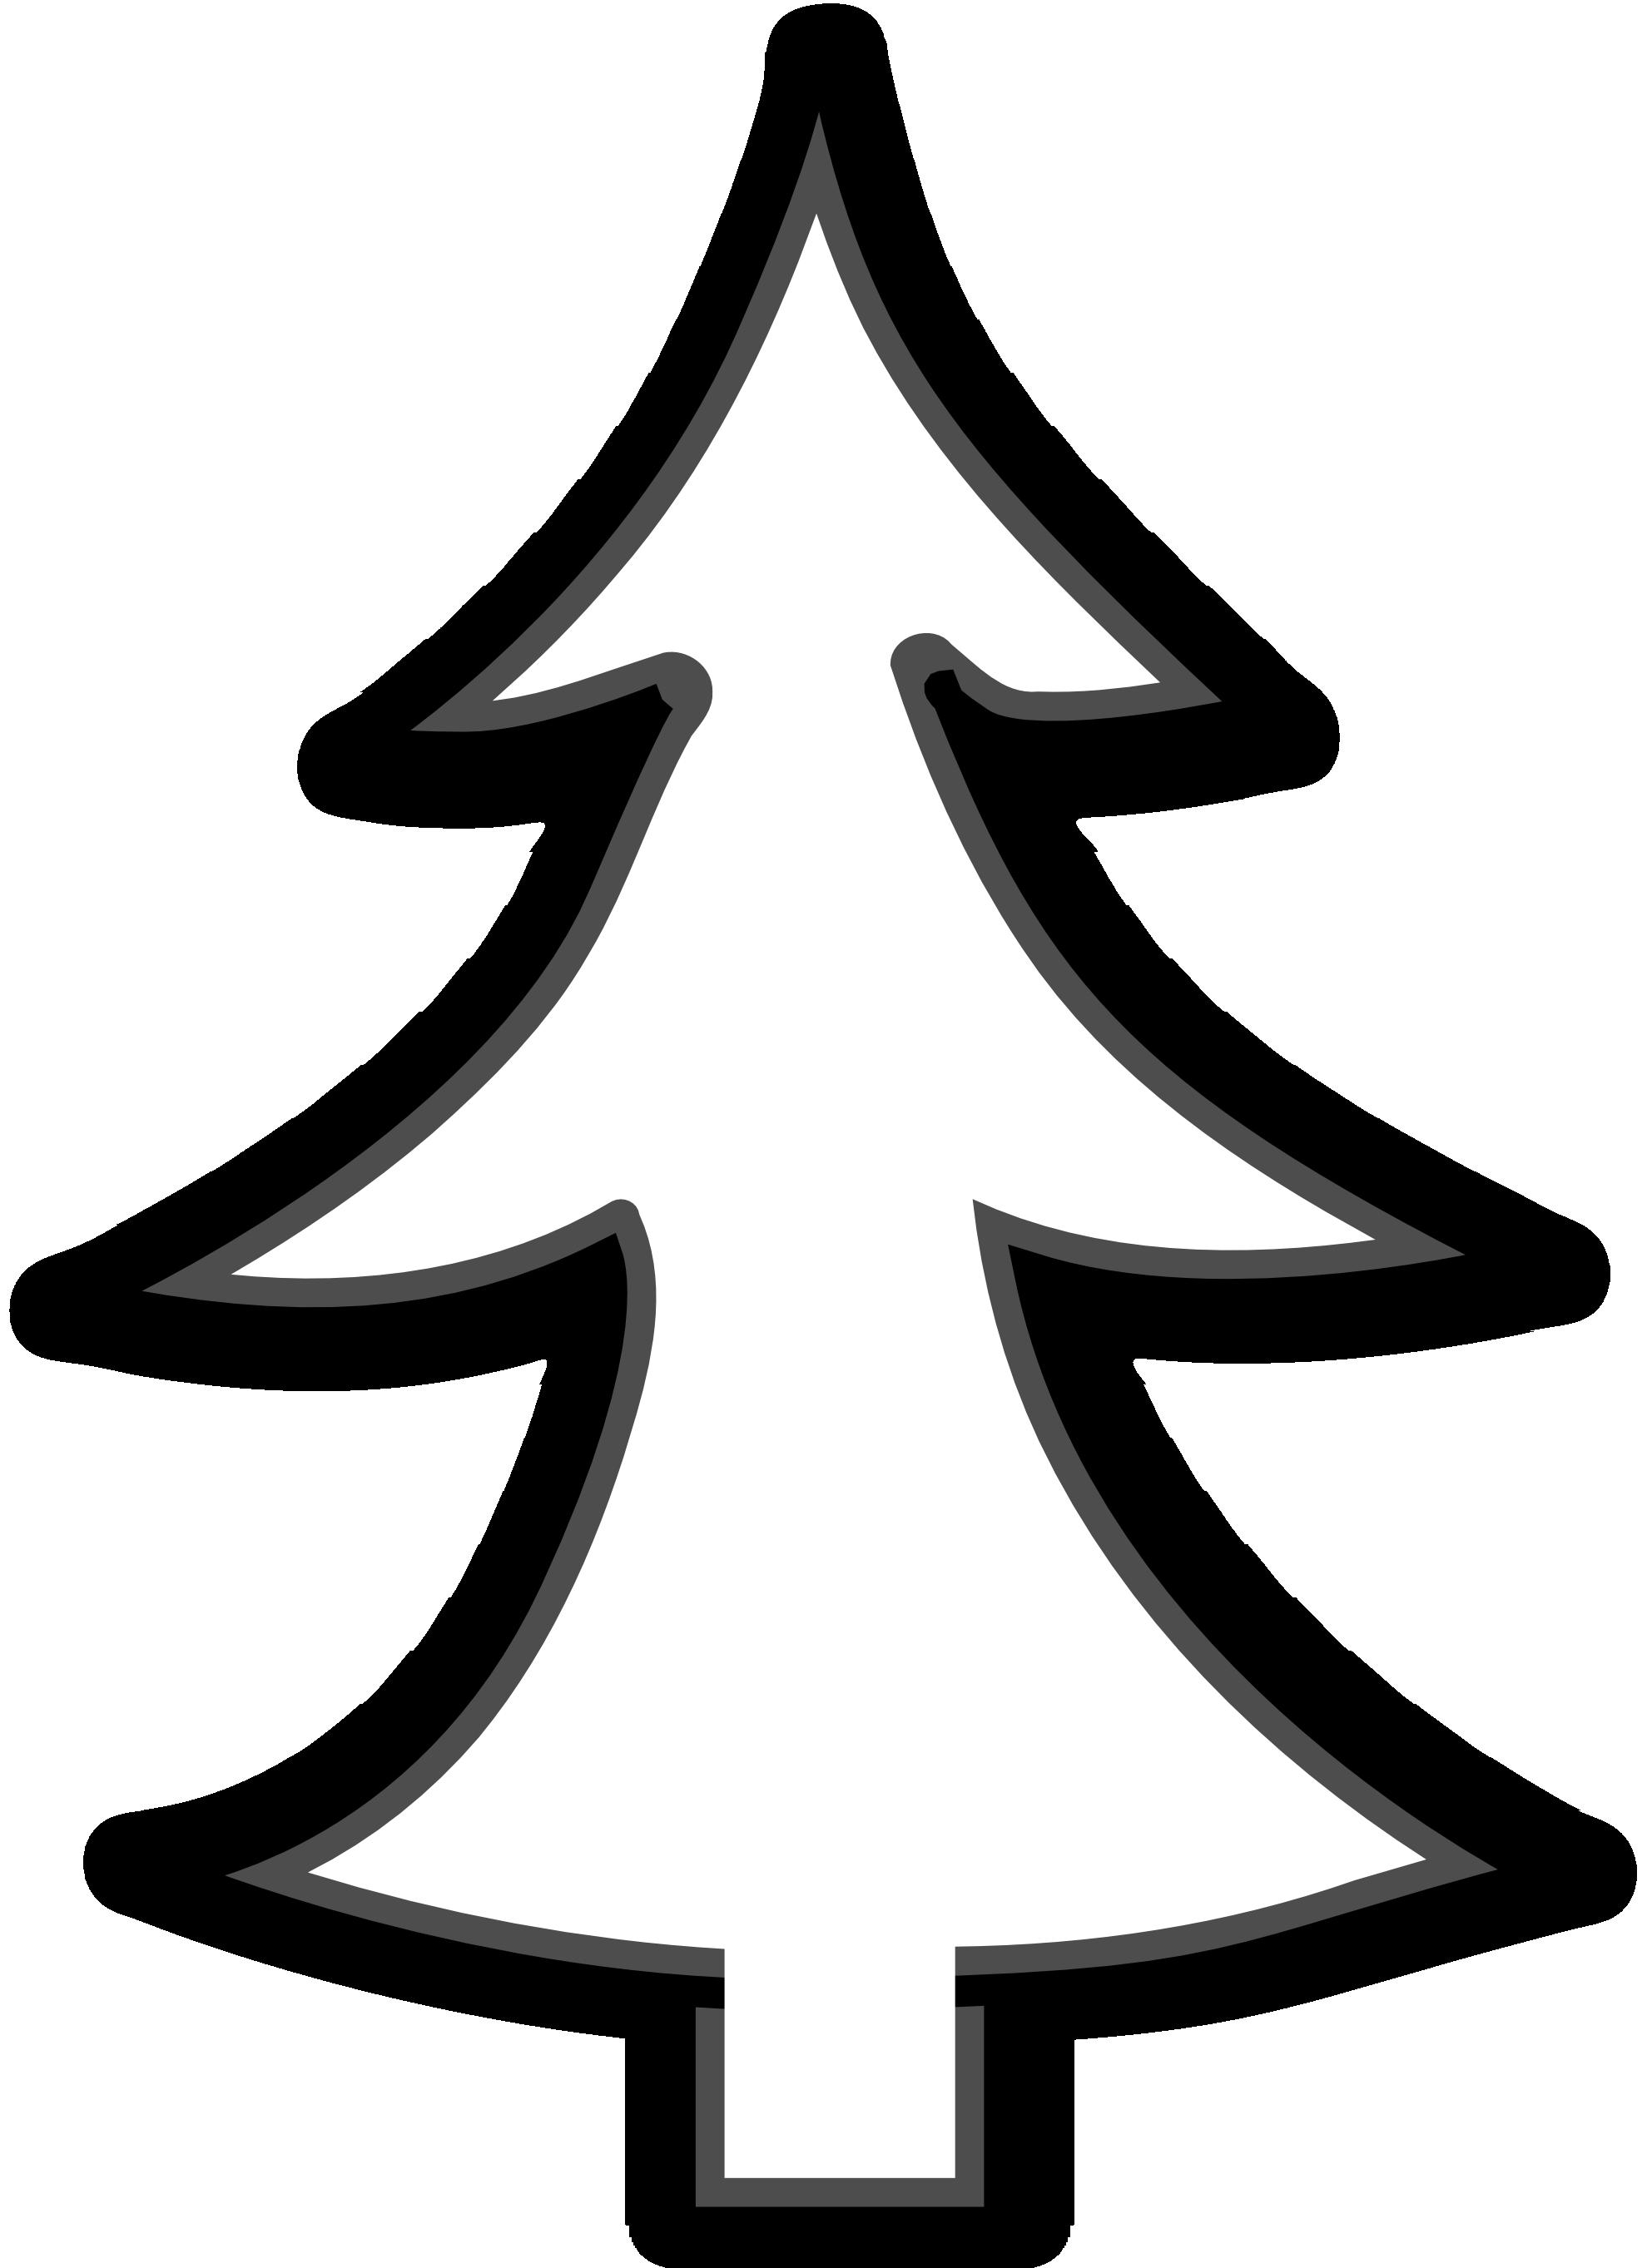 Christmas Tree Outline On Black Clipart - Clipart Kid